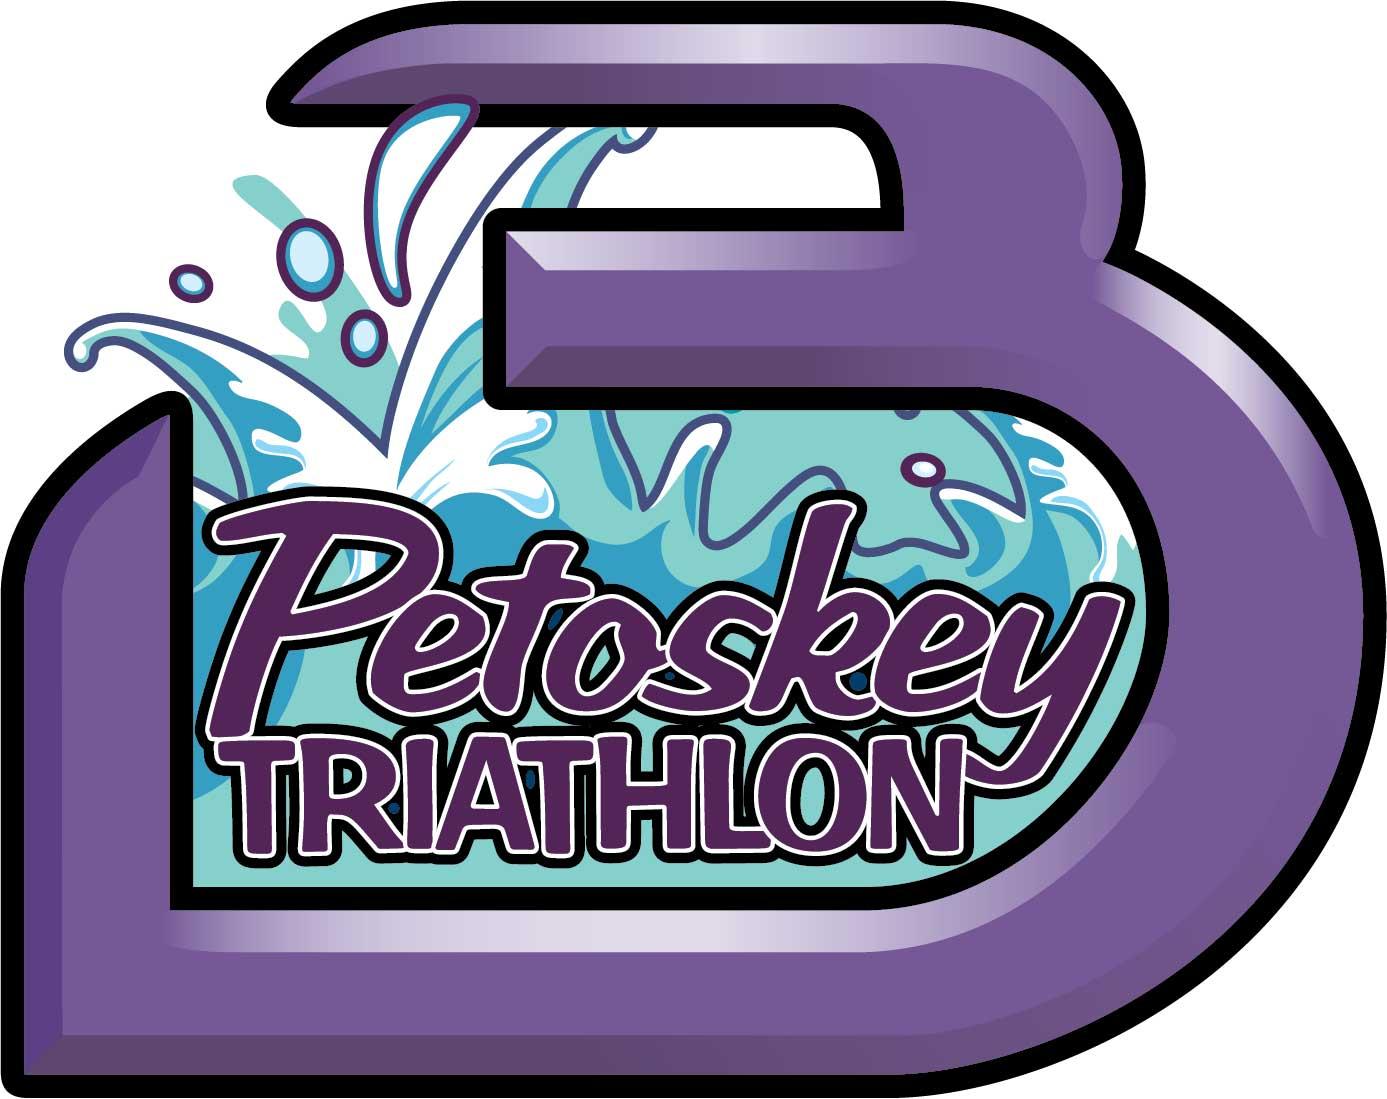 Petoskey-Tri Event